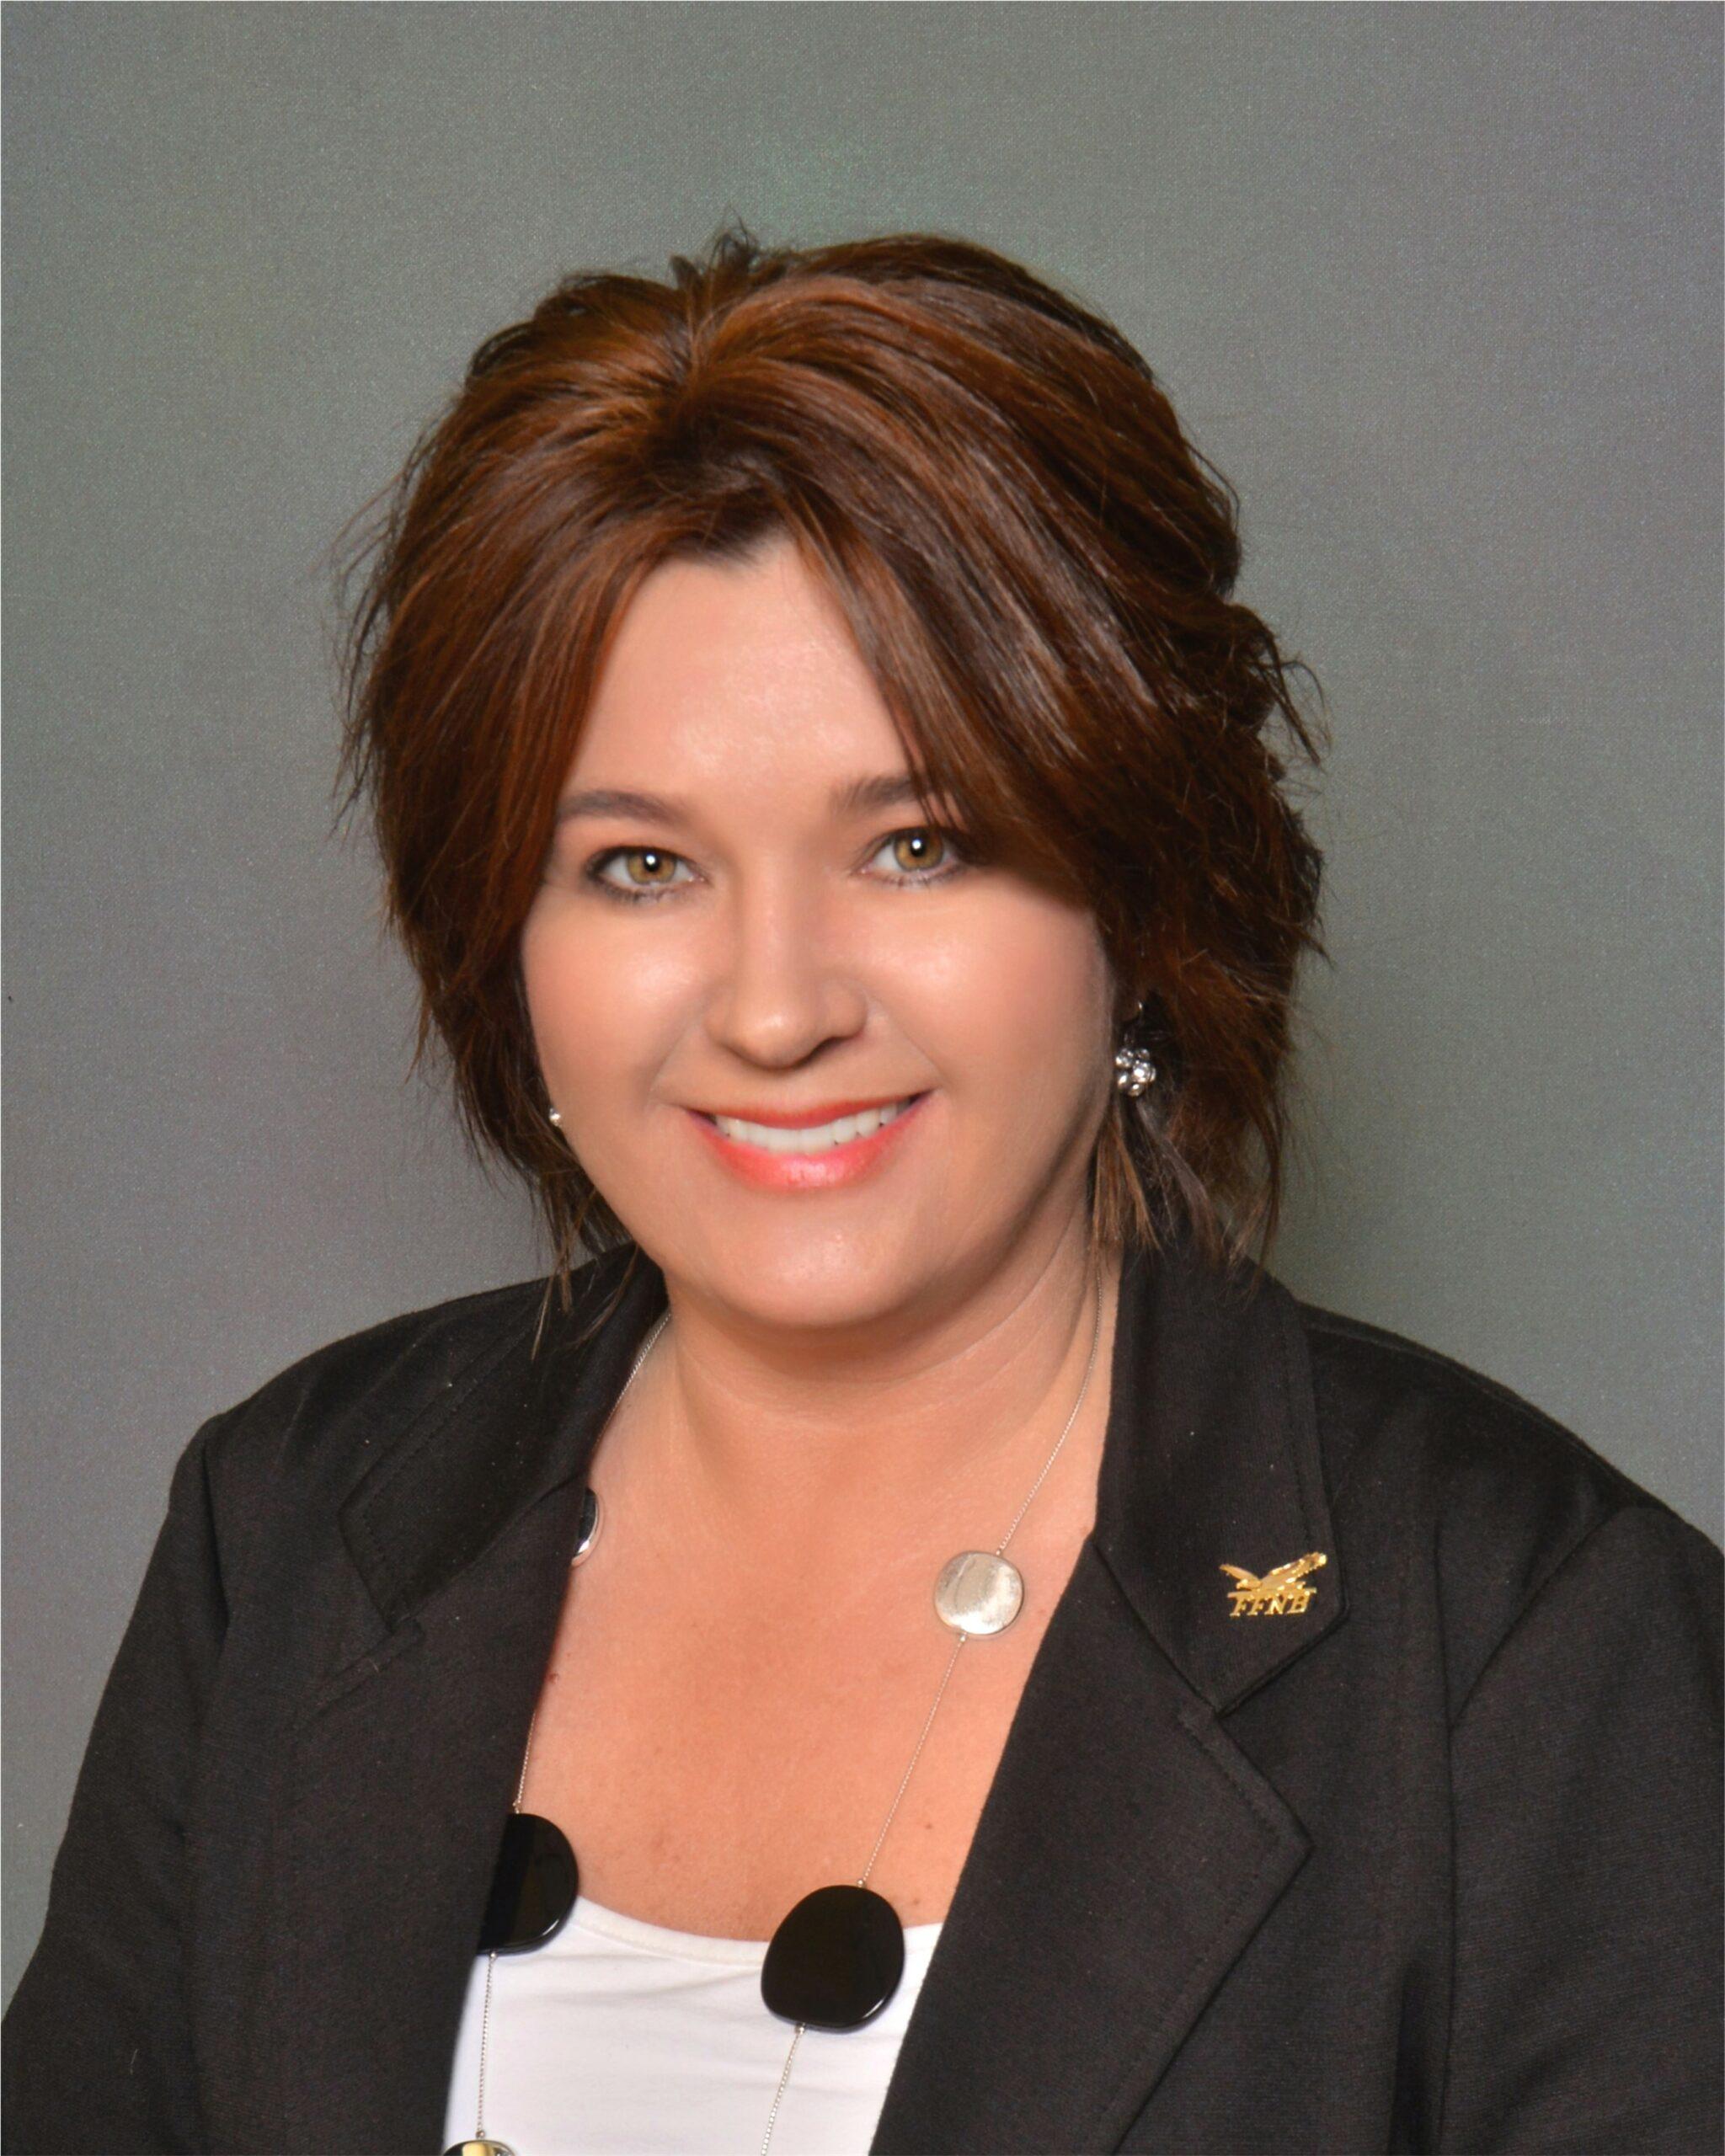 Danette Hancock